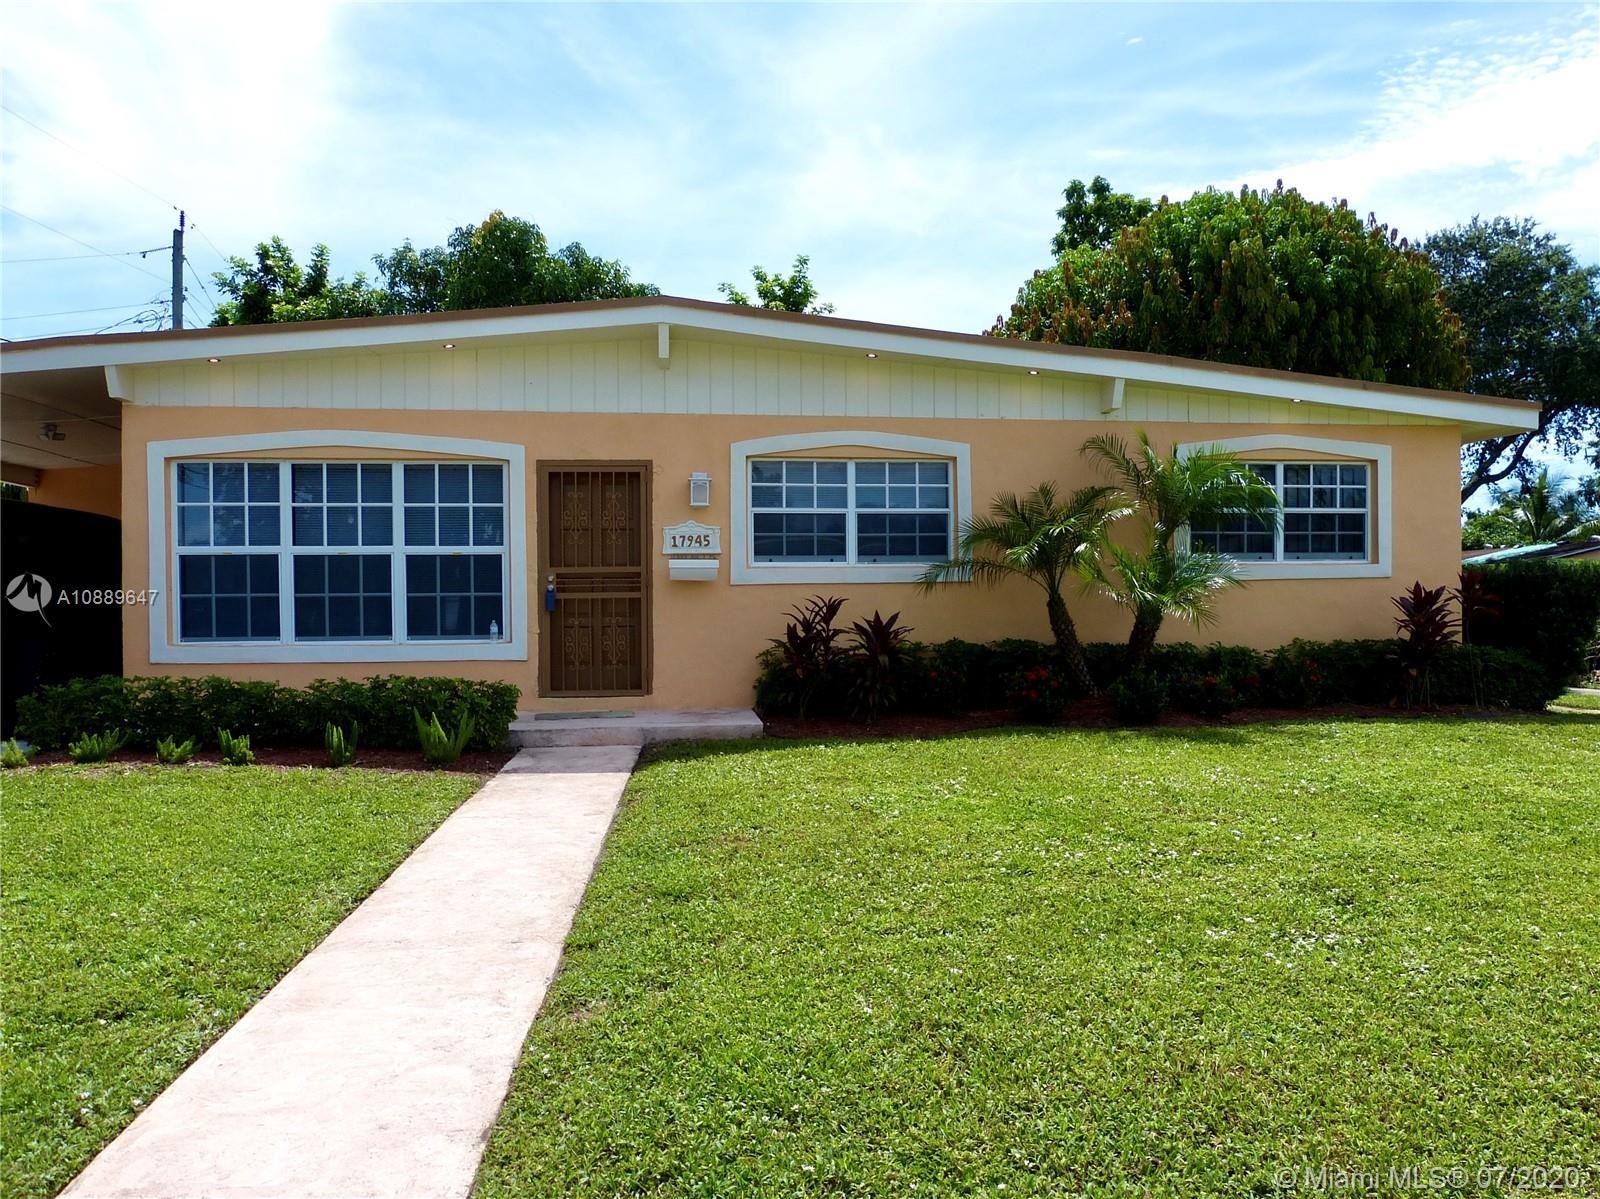 17945 NW 7th PL, Miami Gardens, FL 33169 - #: A10889647